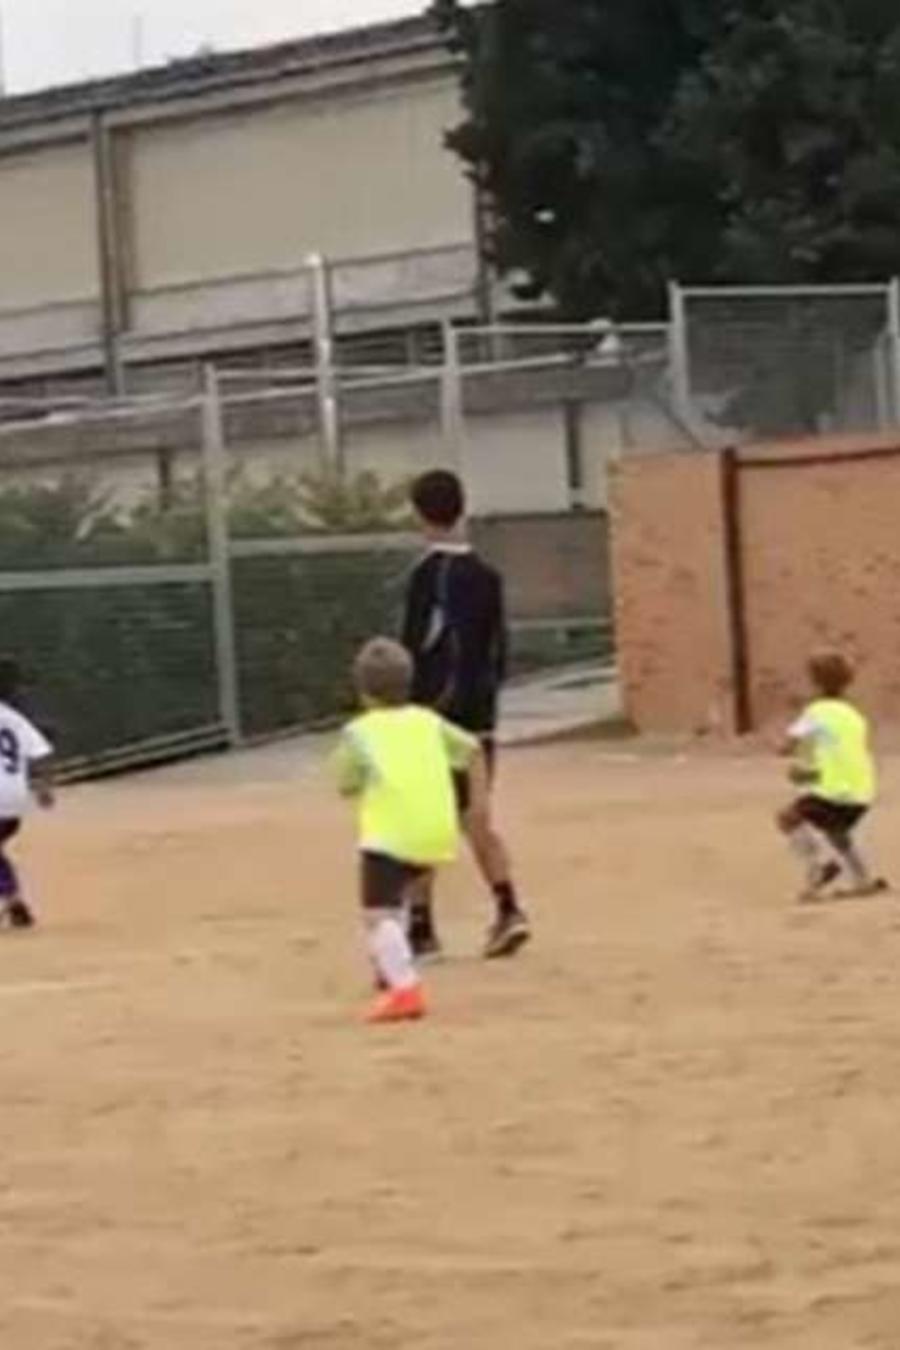 El hijo de Cristiano Ronaldo hizo un golazo